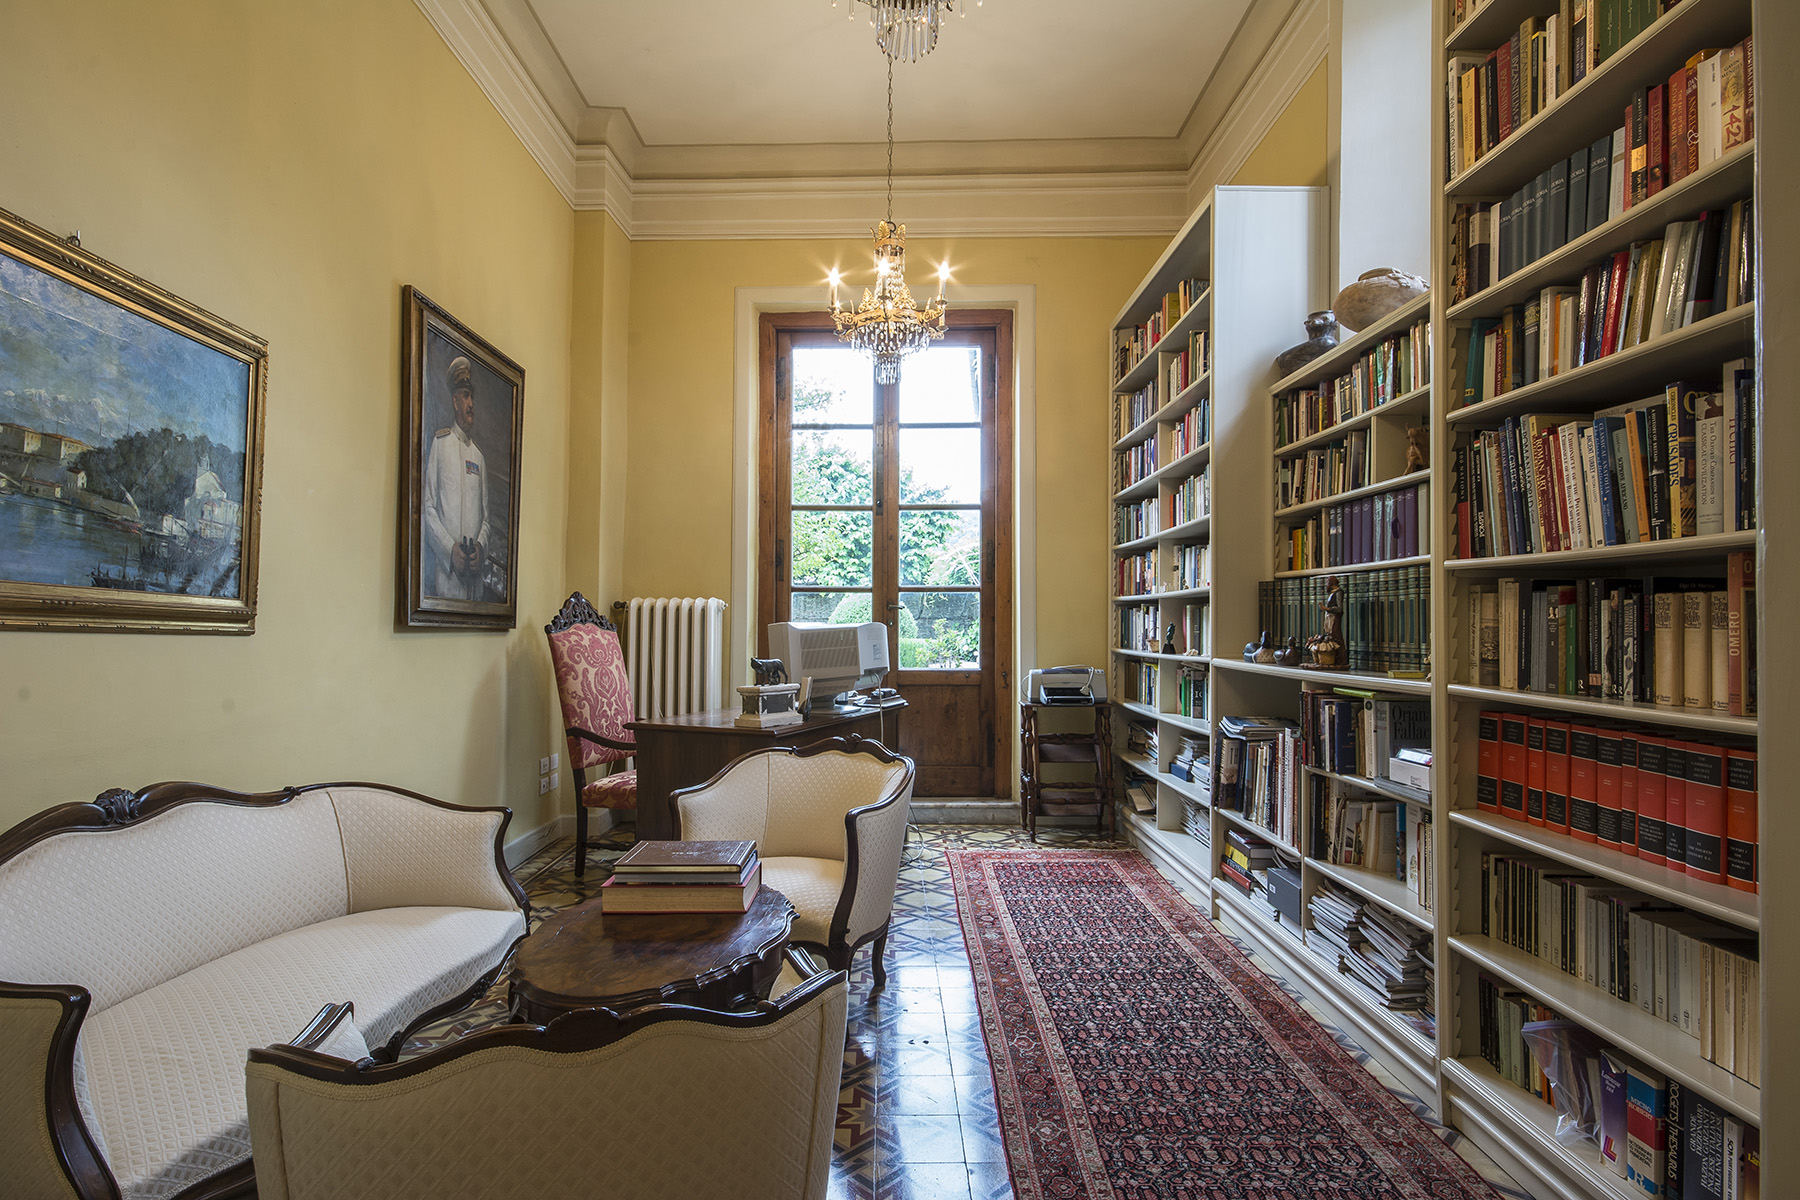 Villa in Vendita a Lucca: 5 locali, 1200 mq - Foto 9